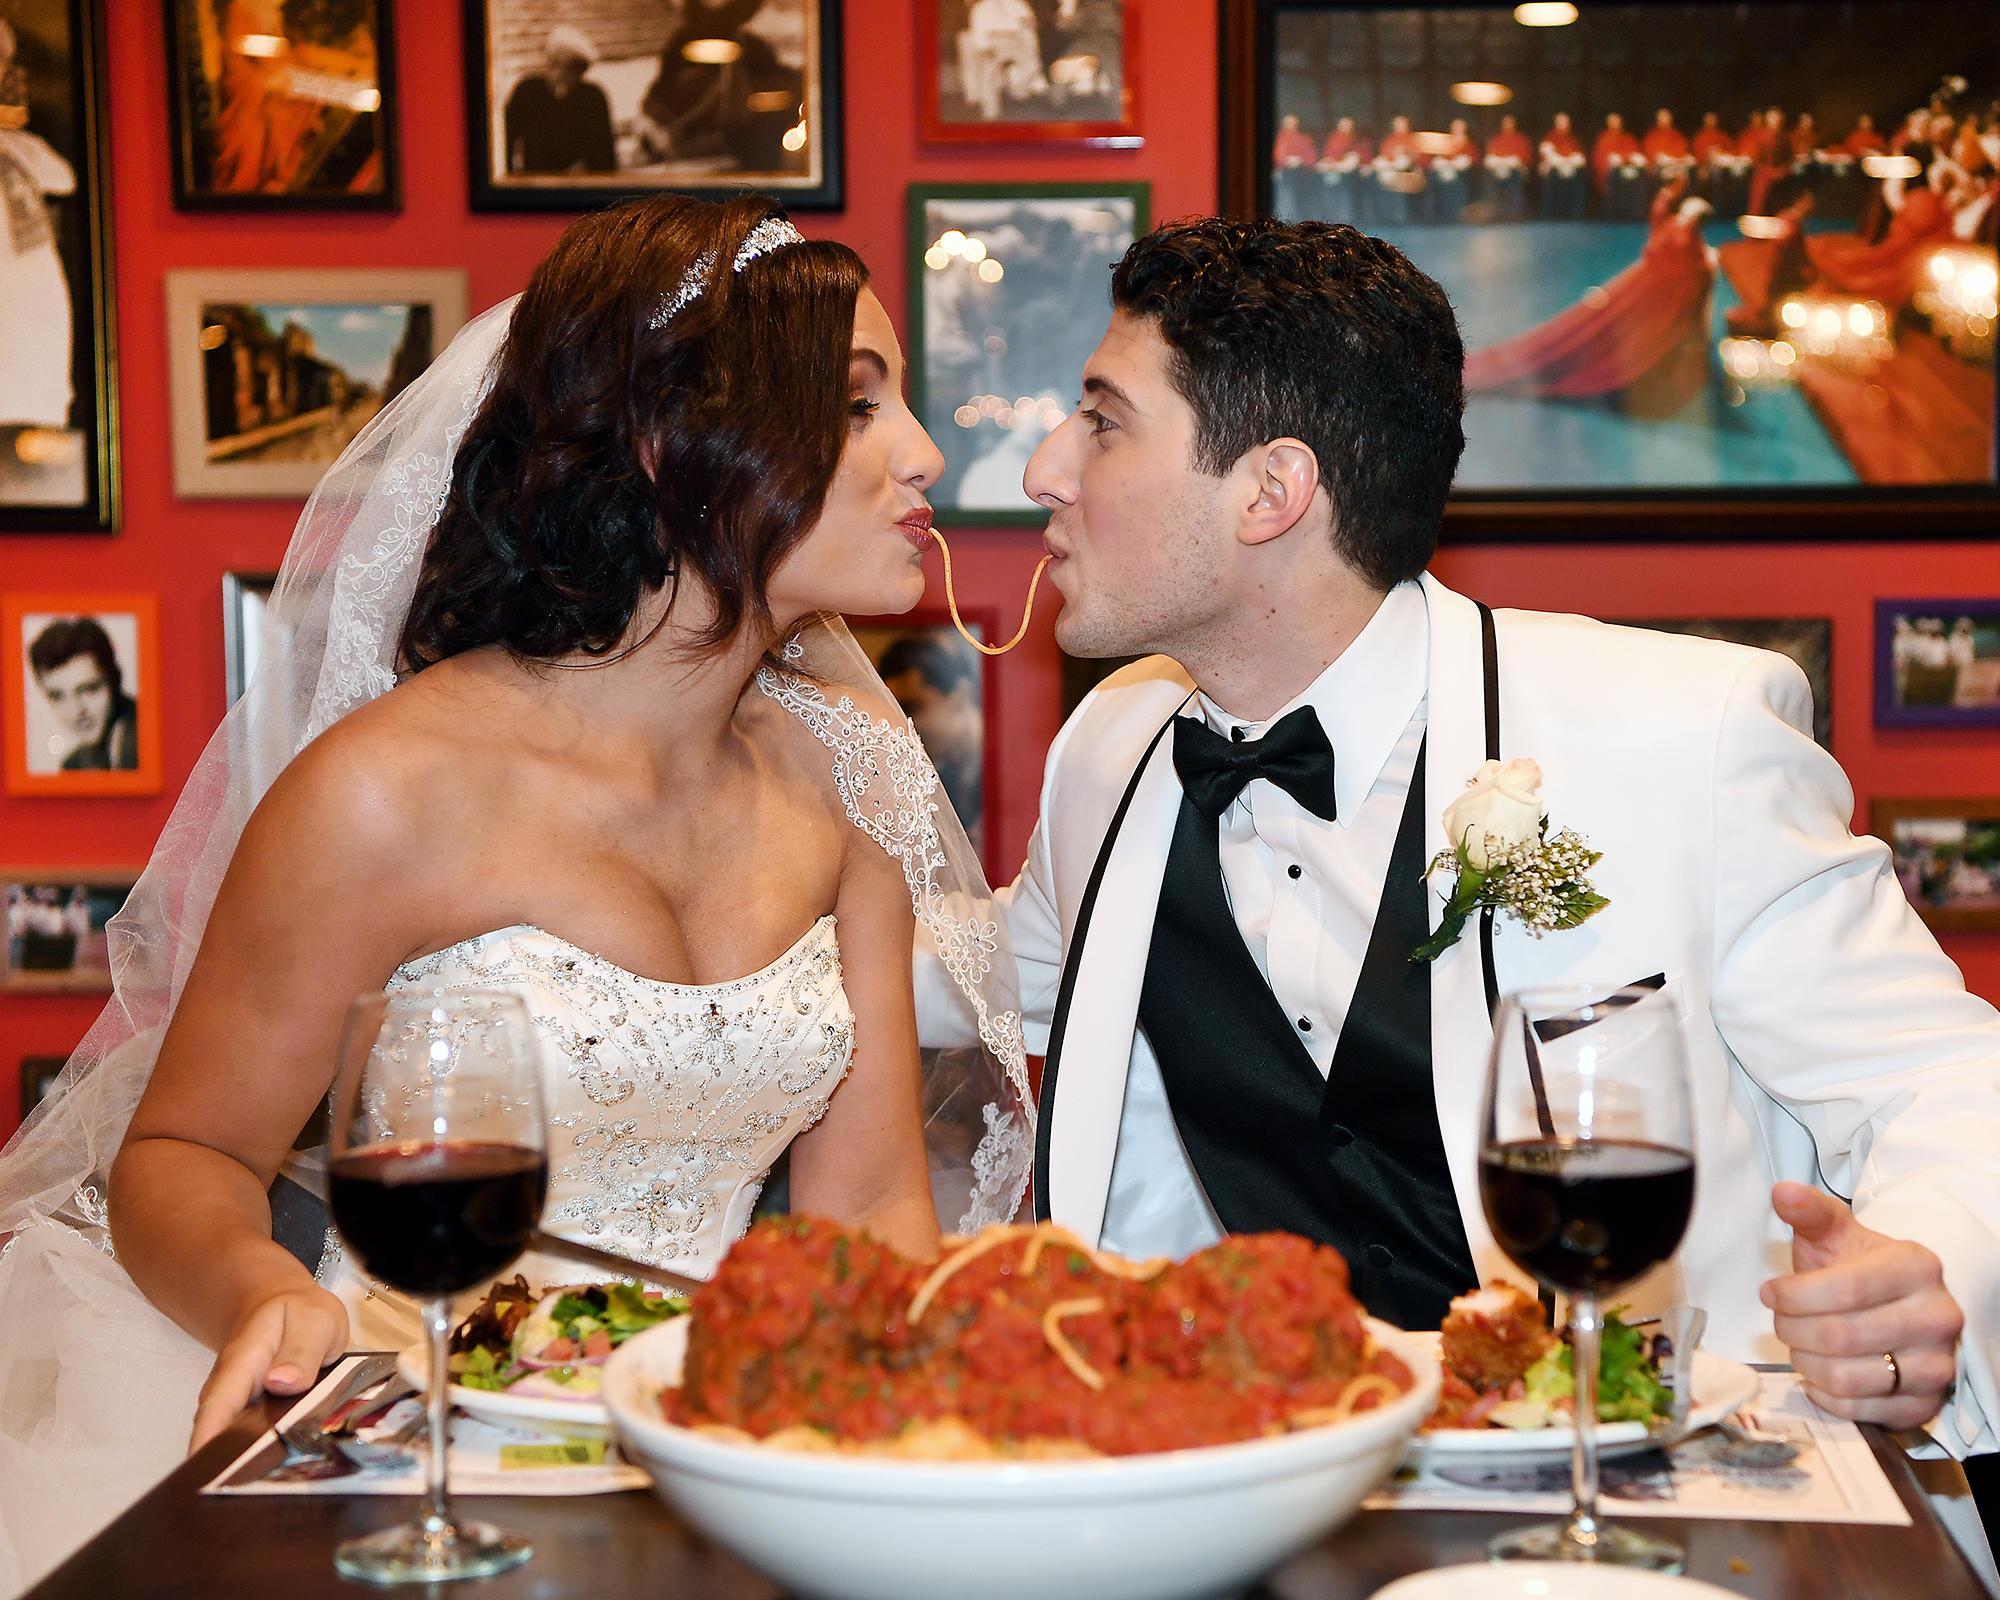 Tony N' Tina's Wedding image 4